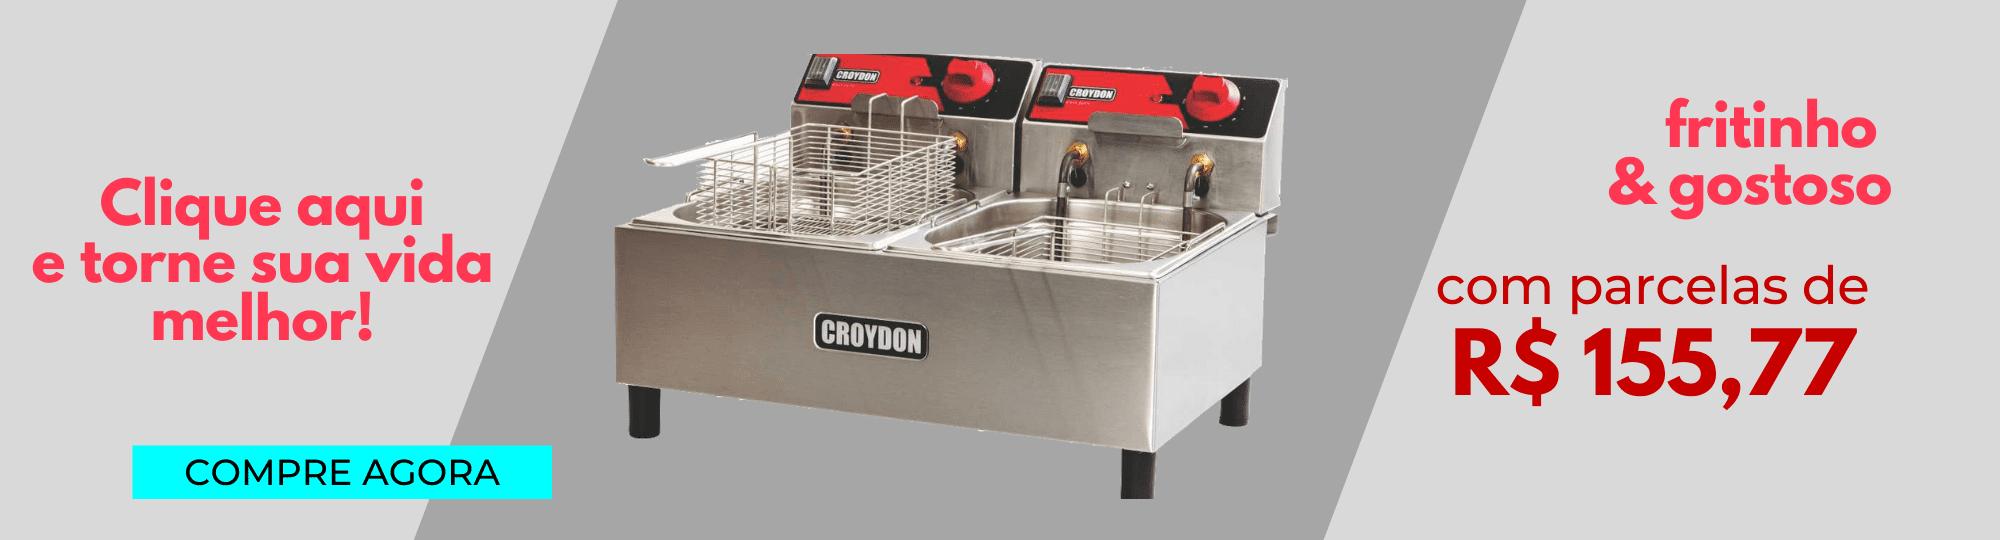 Super Promoções - Fritadeira Elétrica Dupla - Croydon